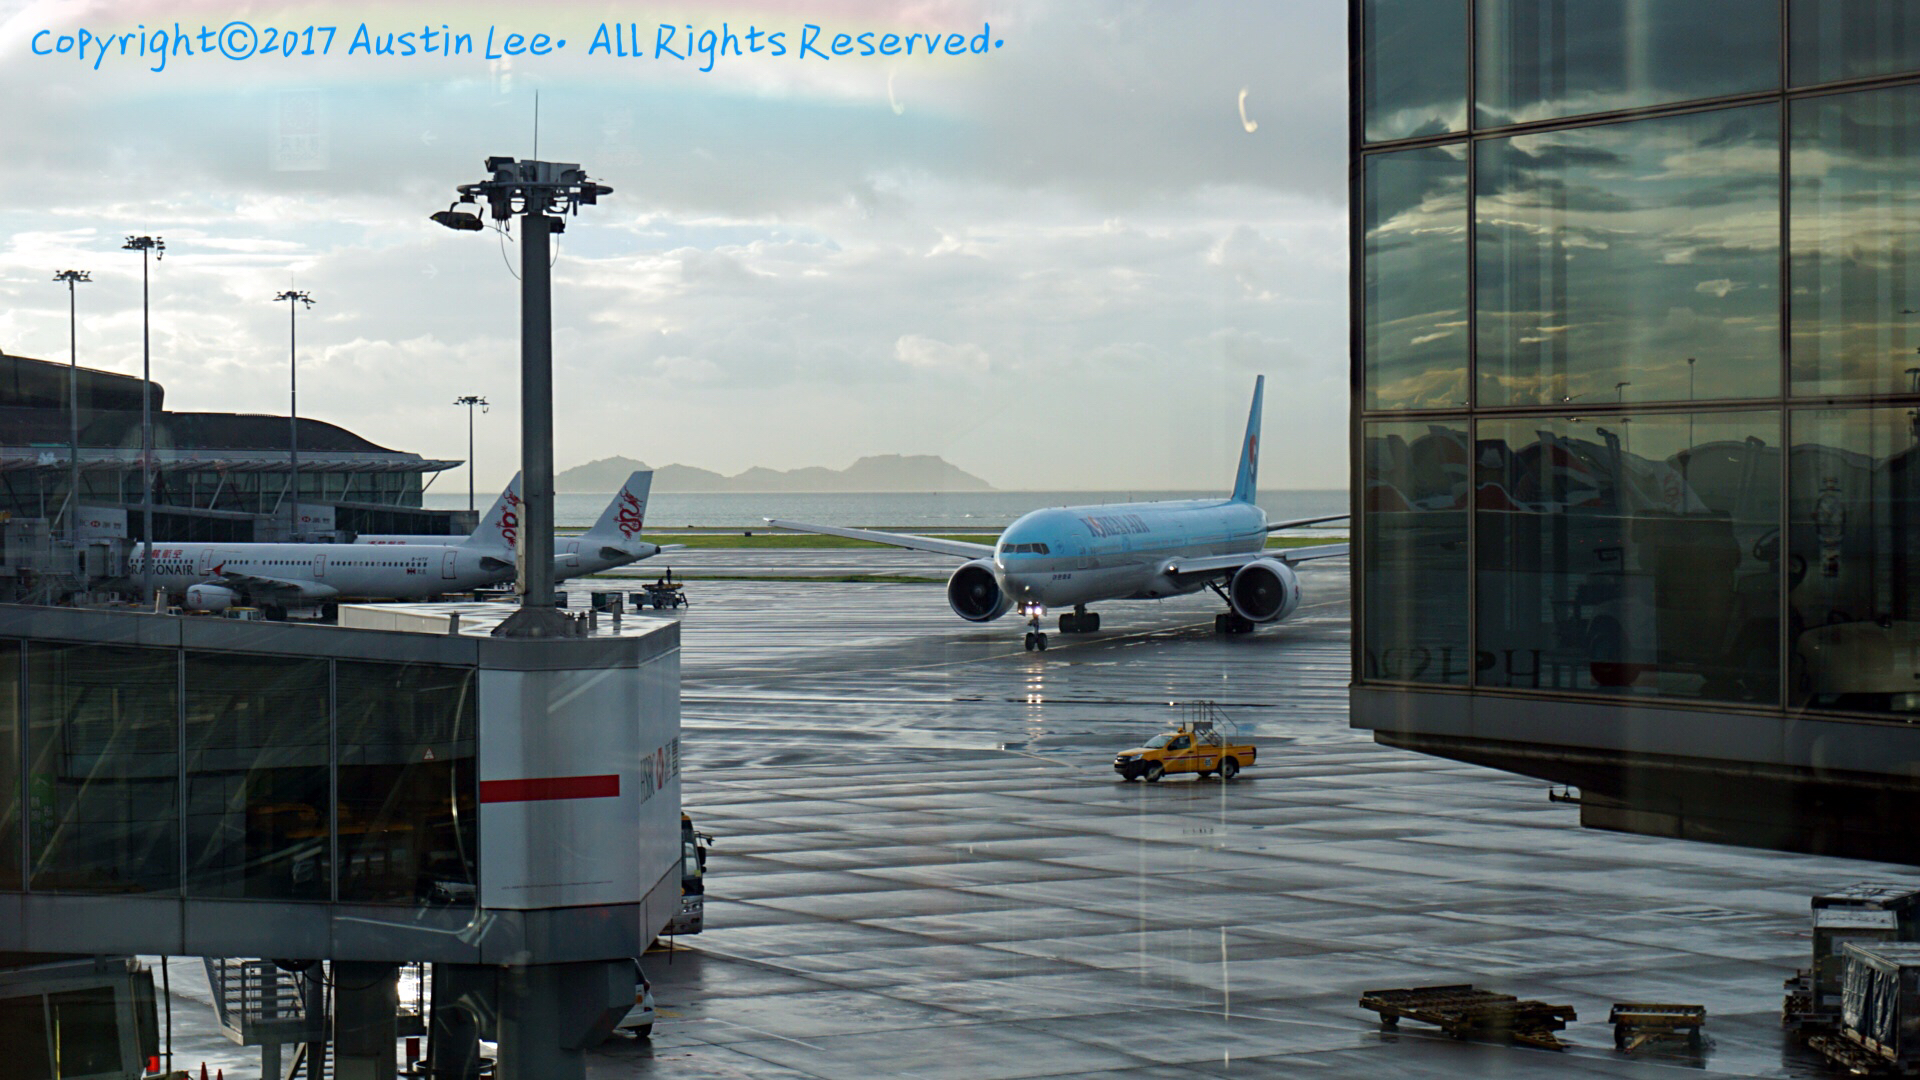 Re:[原创]论坛修复后第一波~旧图新发~都是重型~ BOEING 777-3B5(ER) HL7782 中国香港国际机场